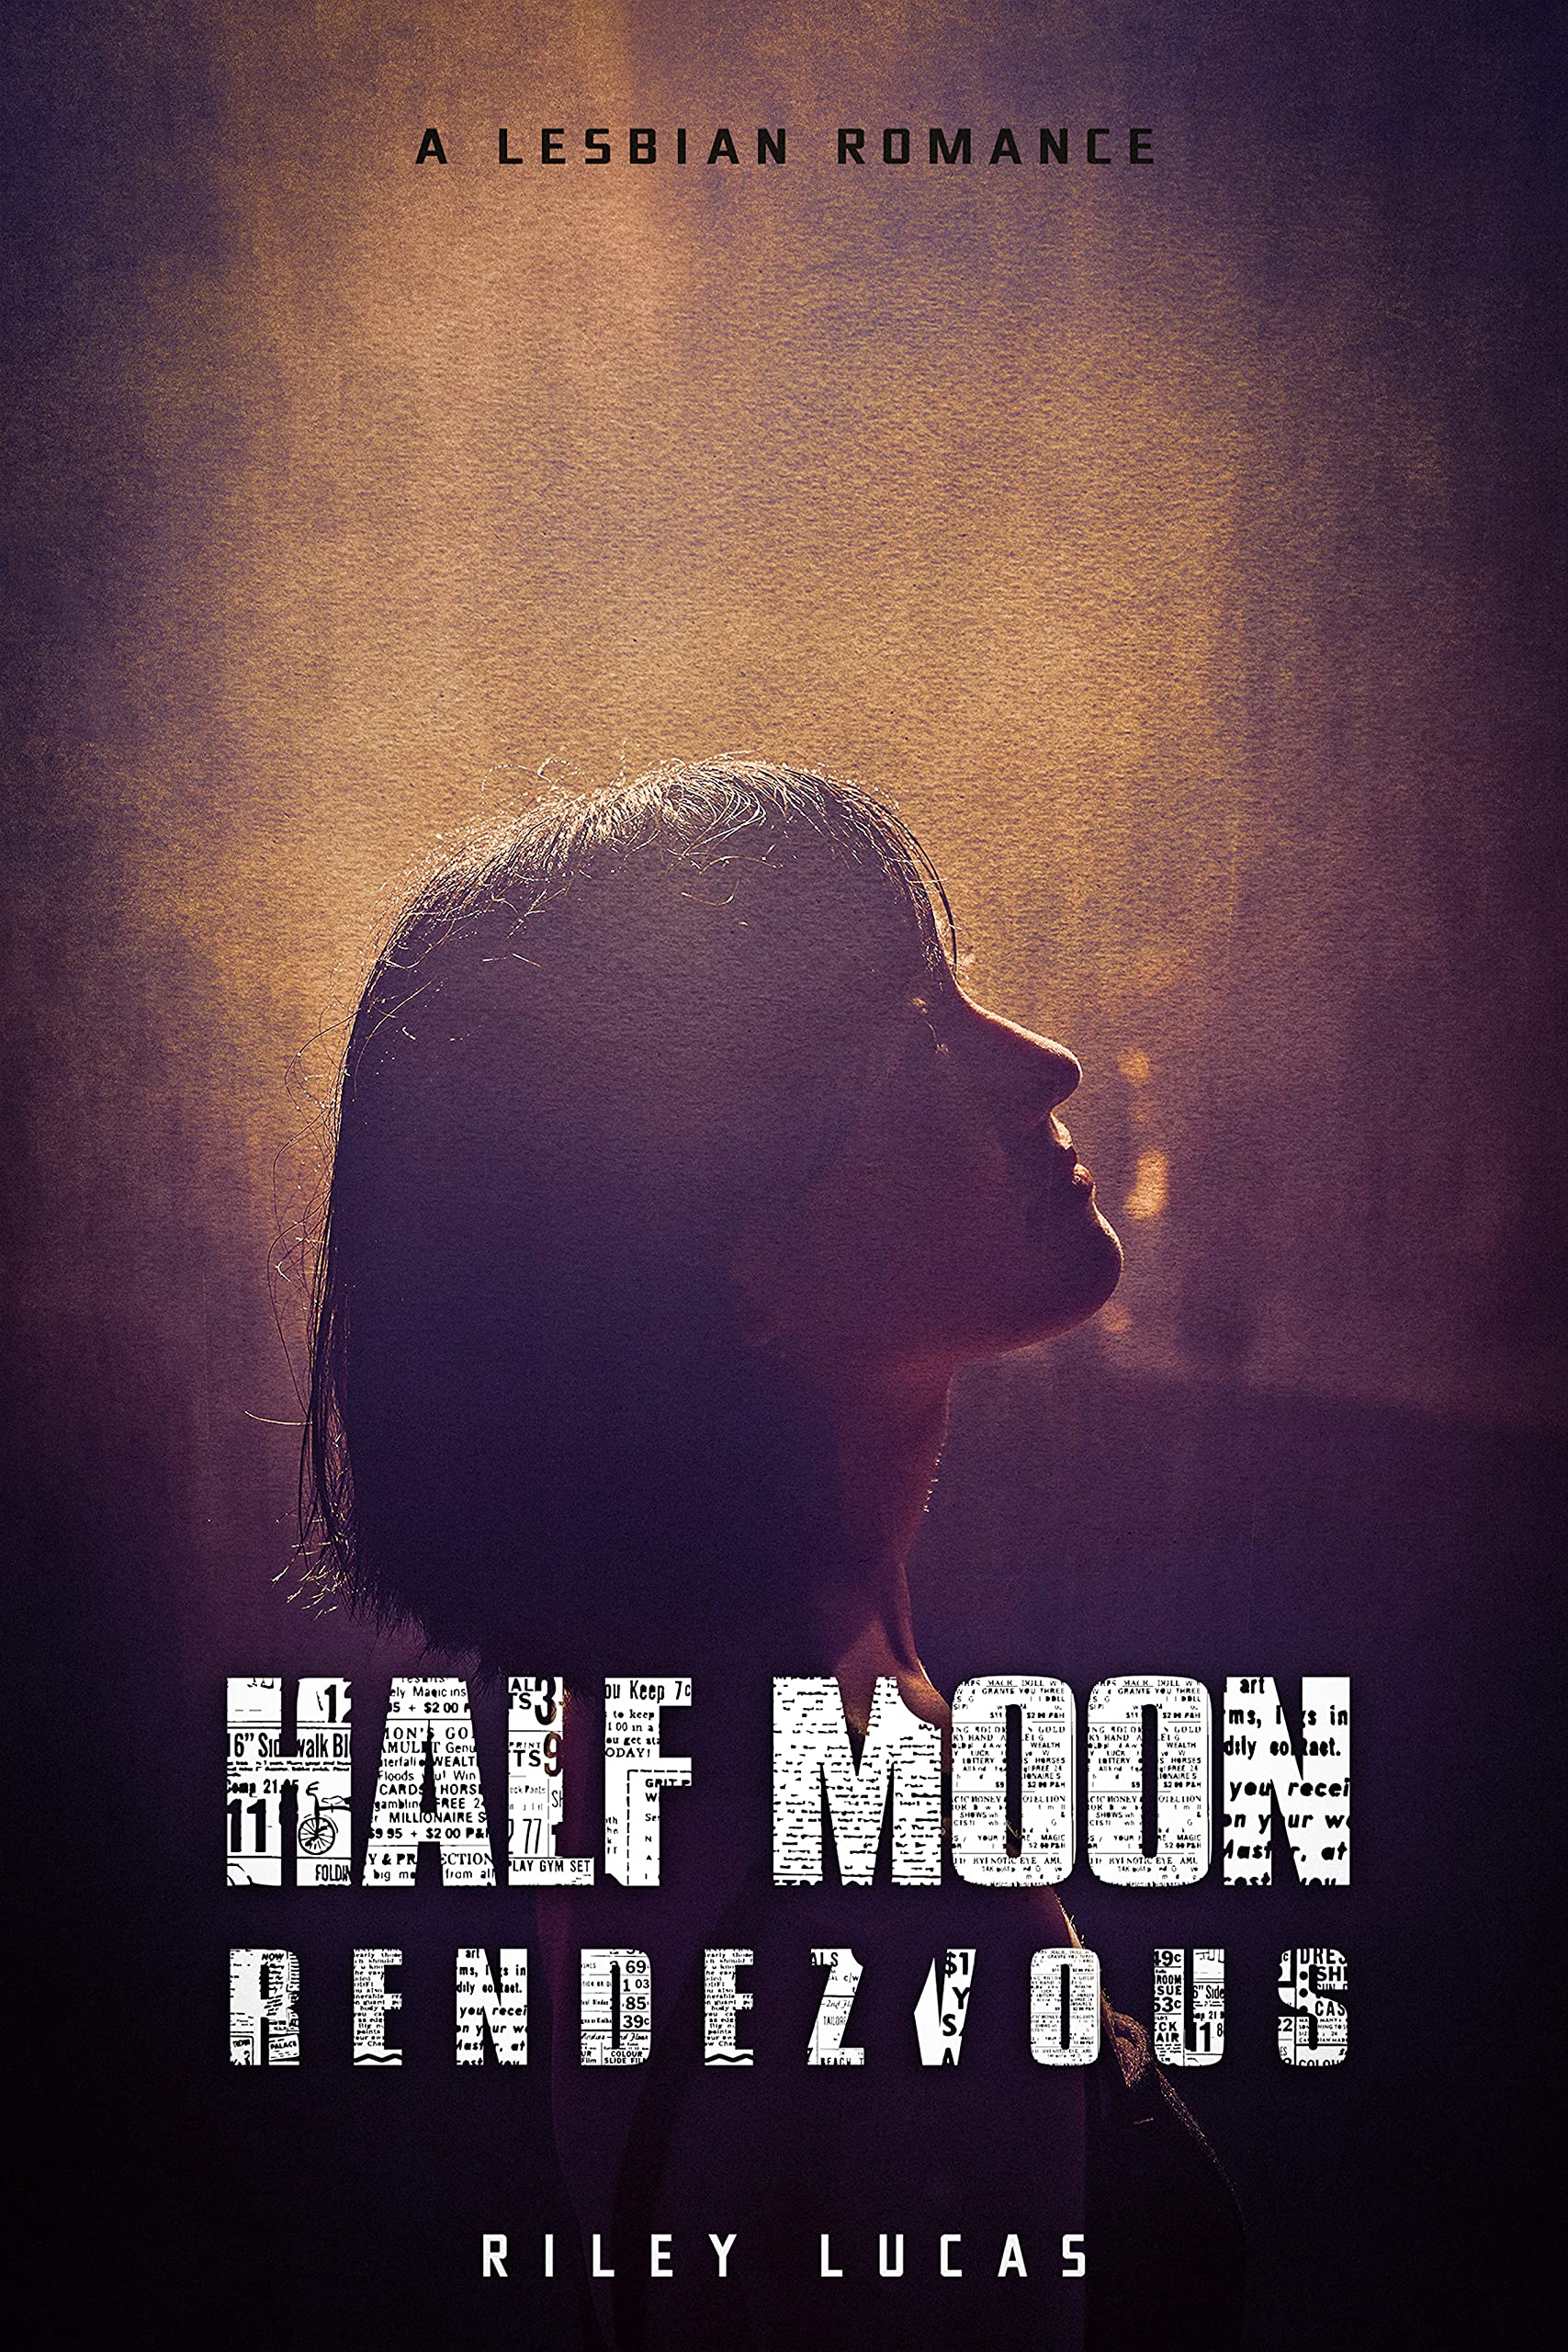 Half Moon Rendezvous: A lesbian romance